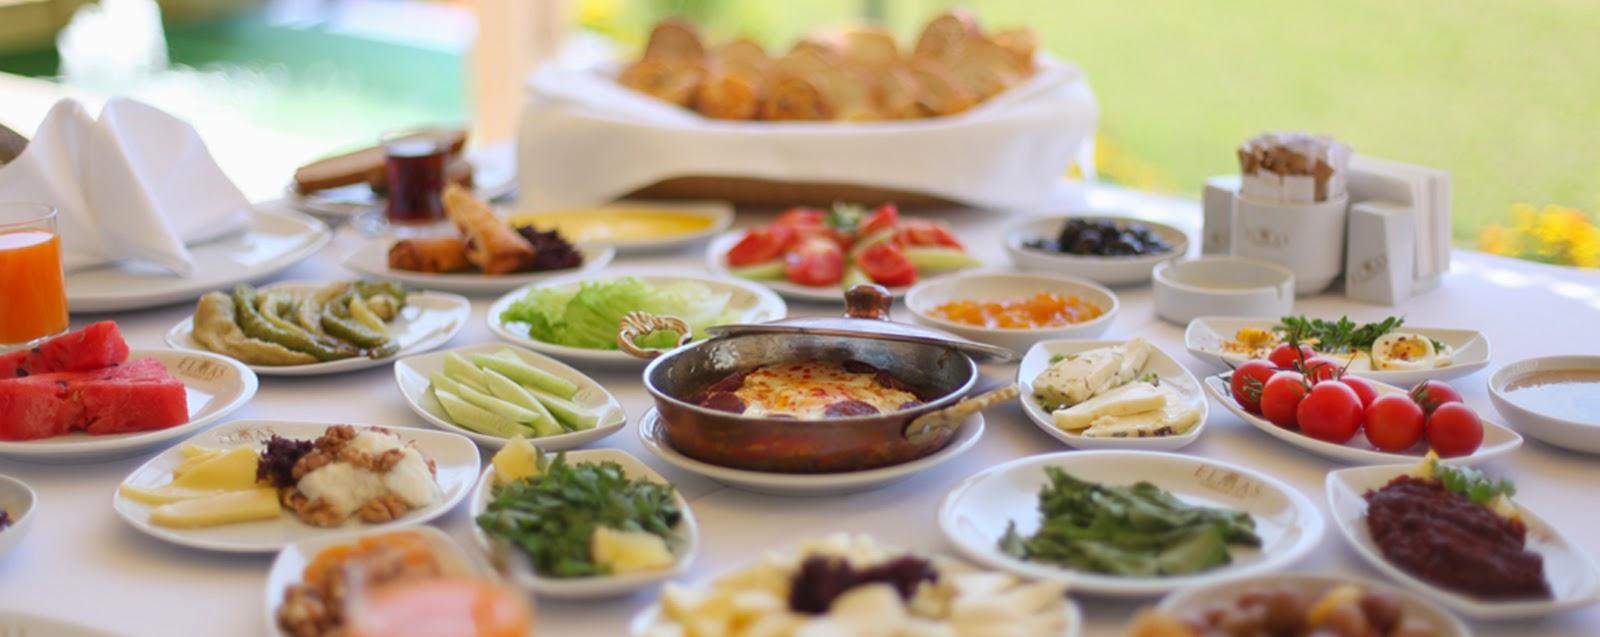 turkish breakfast amazing